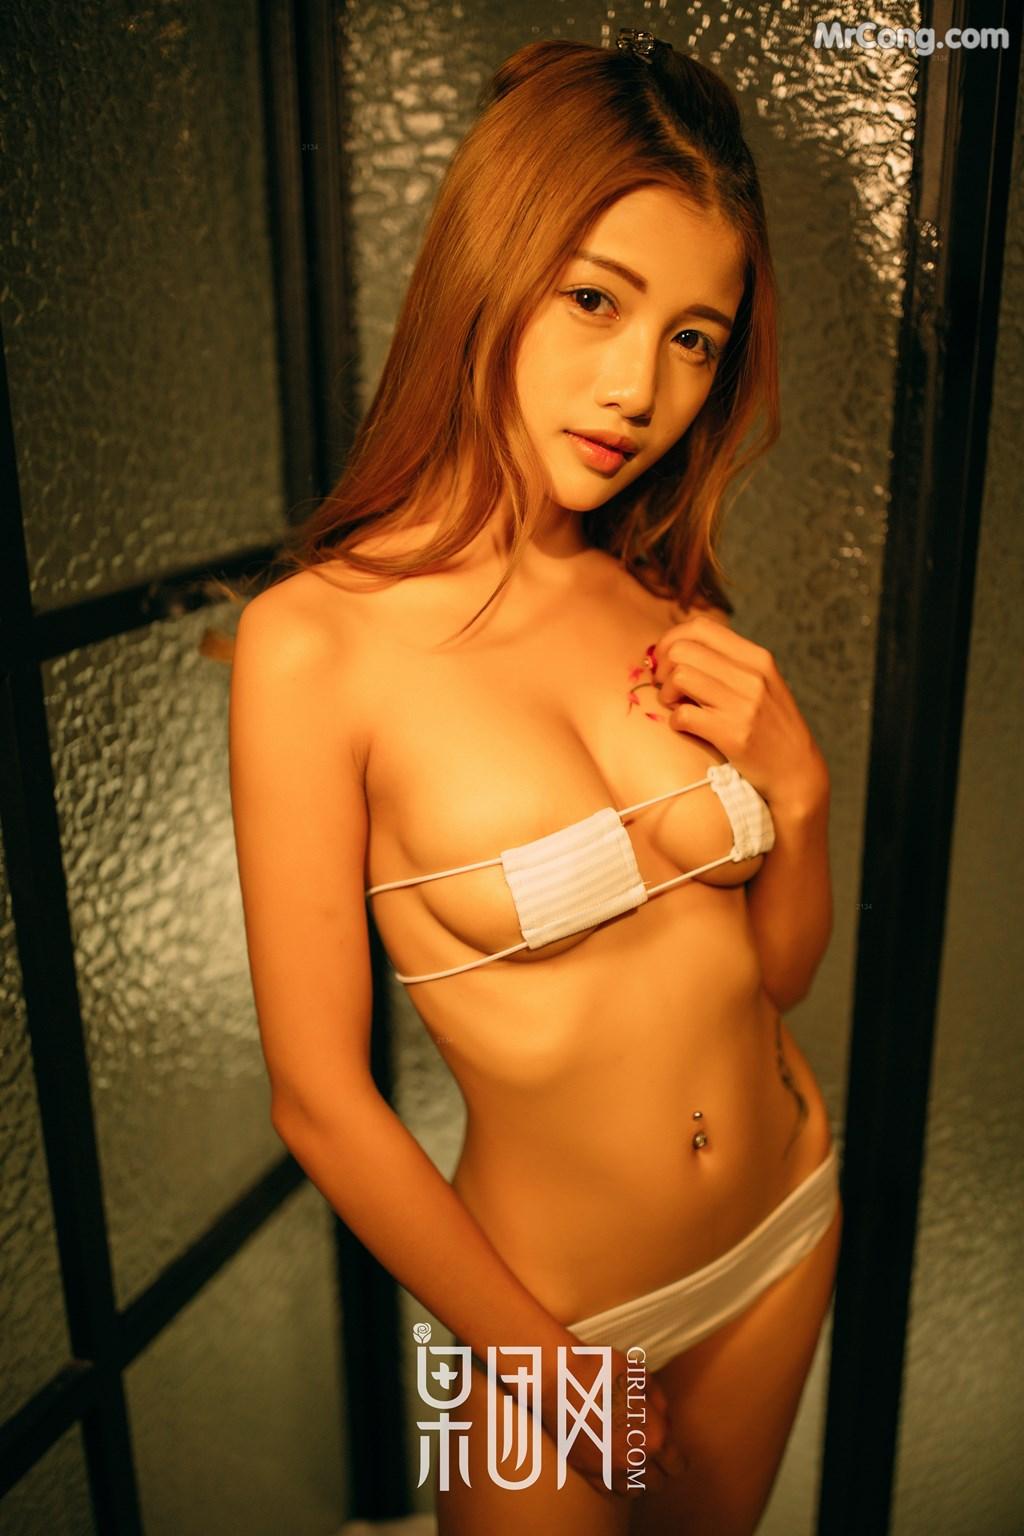 Image GIRLT-XCJX-No.011-MrCong.com-039 in post GIRLT XCJX No.011 (54 ảnh)